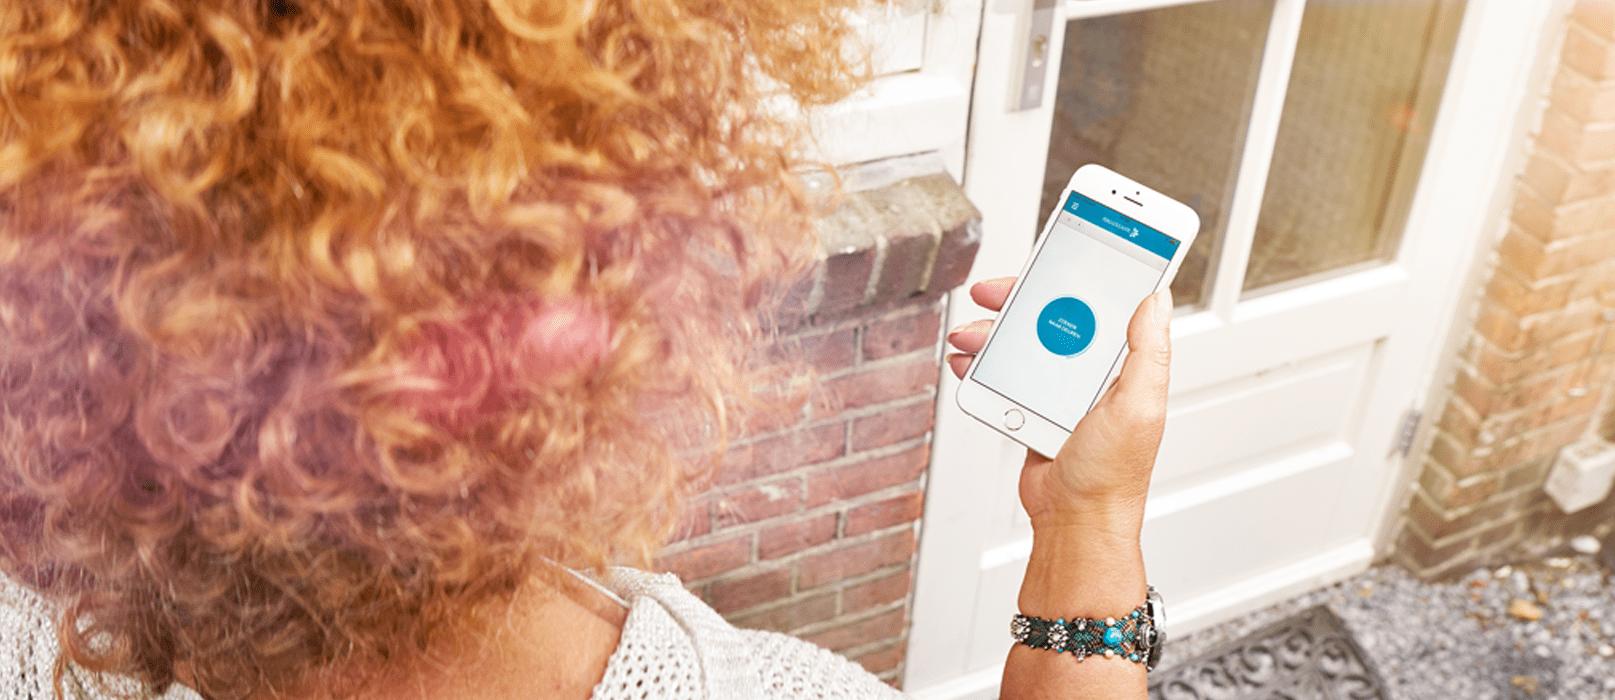 Caregiver using the cKey app to open the door